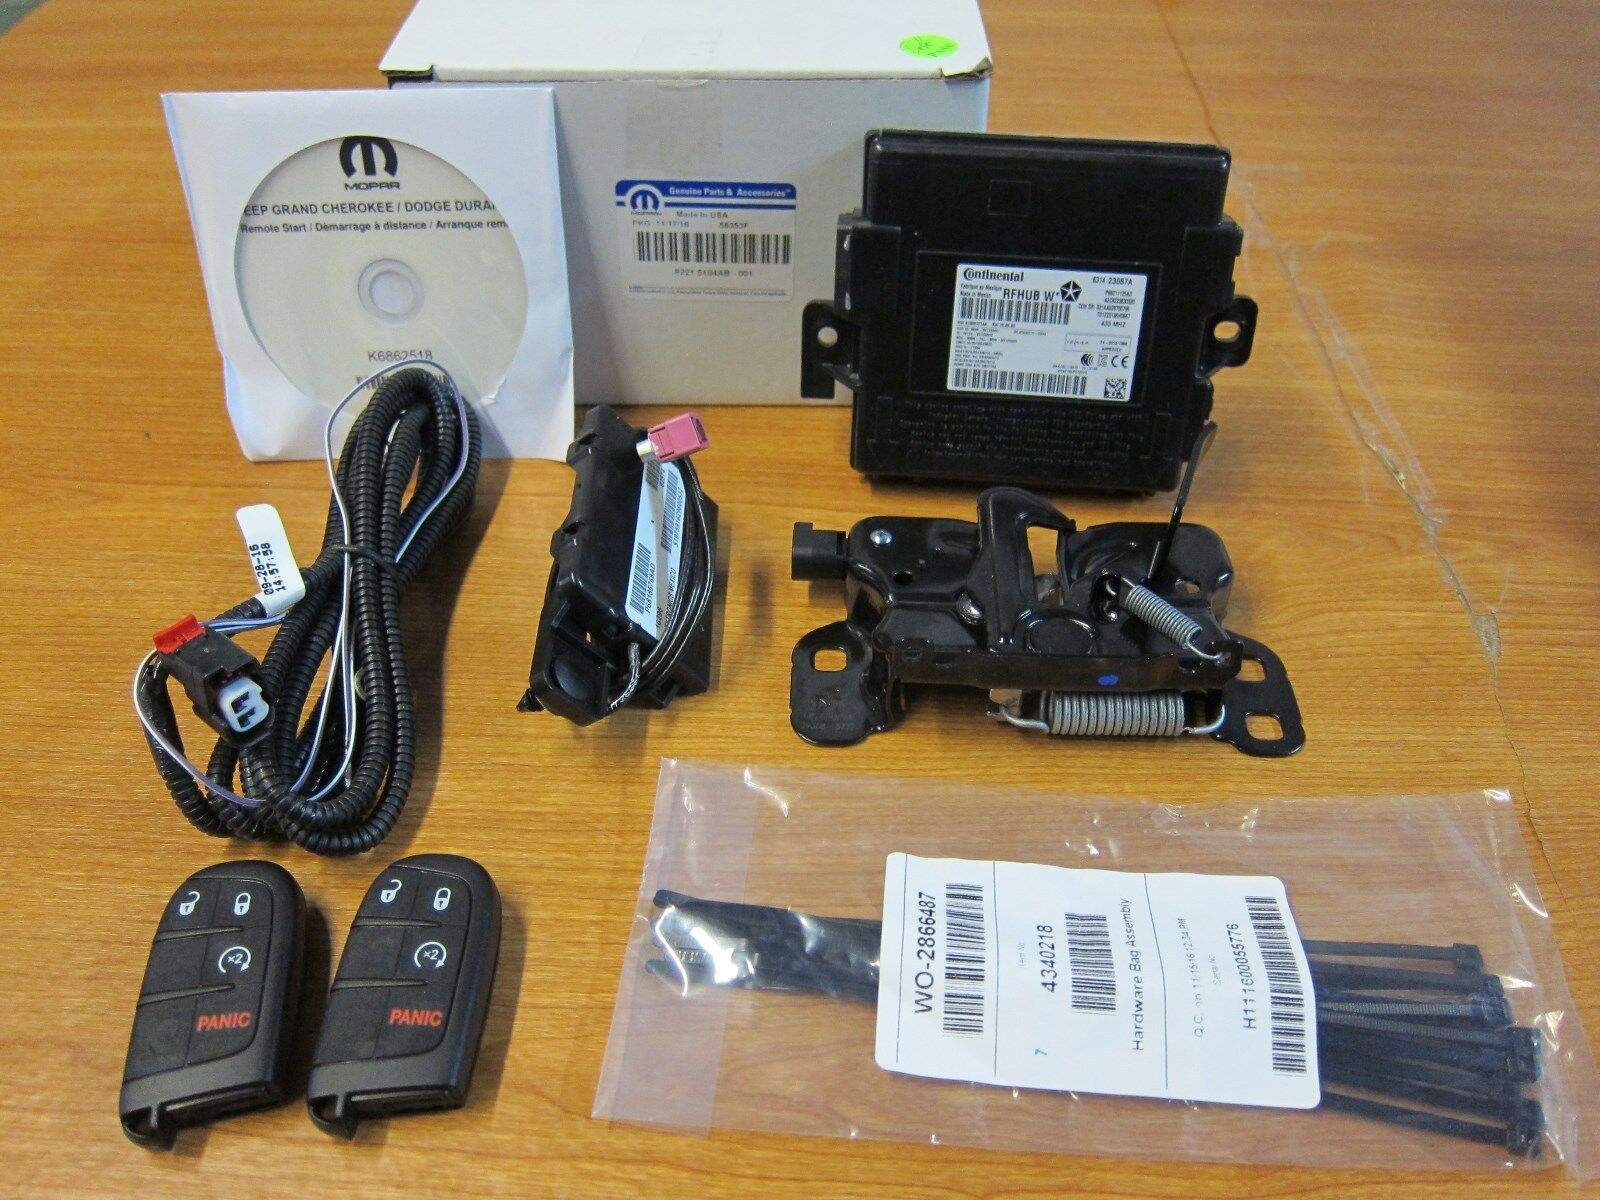 2016 2017 Dodge Durango Oem Remote Start Ignition Installation Kit 2 Keys